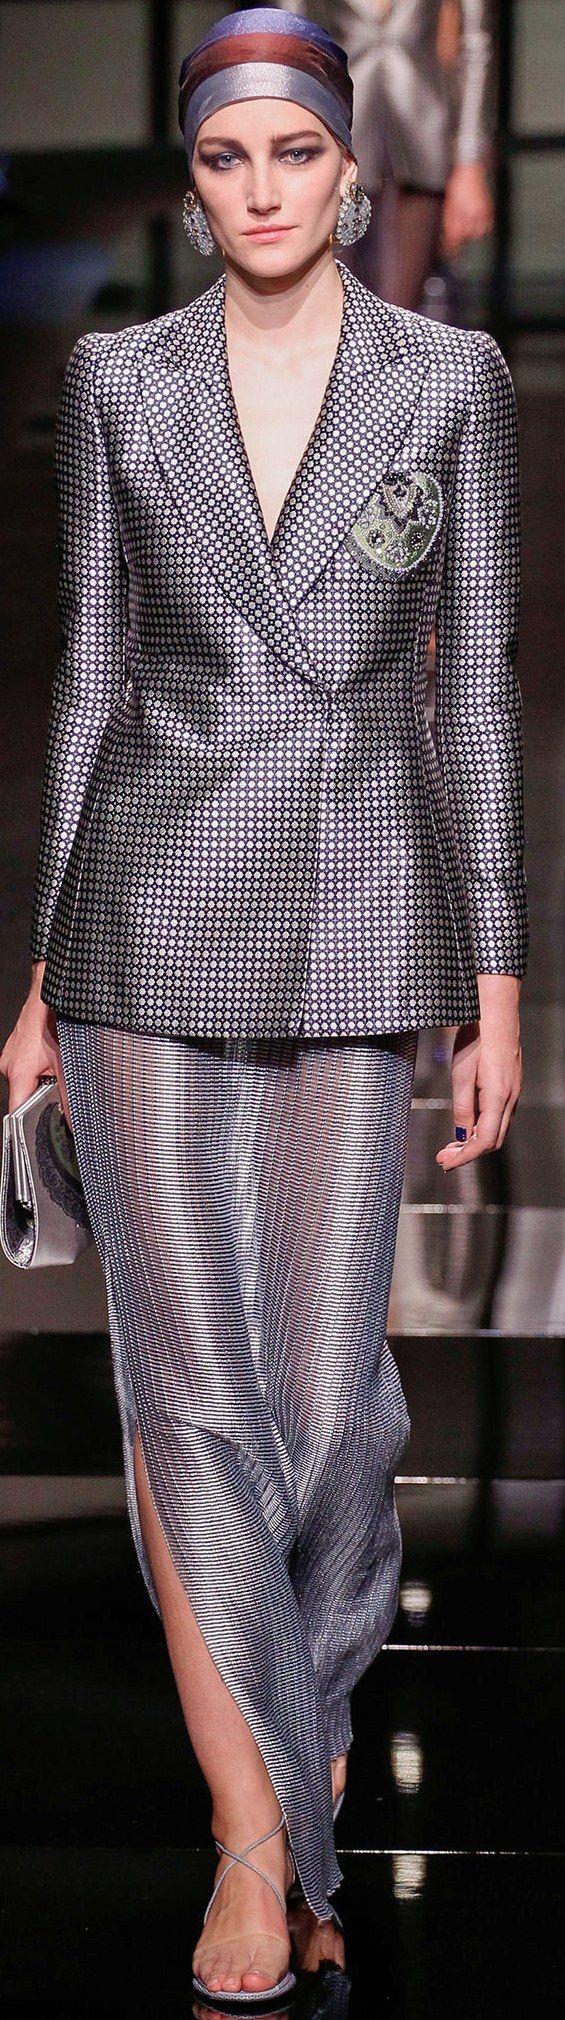 Armani Privé - Couture - Spring ♕BOUTIQUE CHIC♕